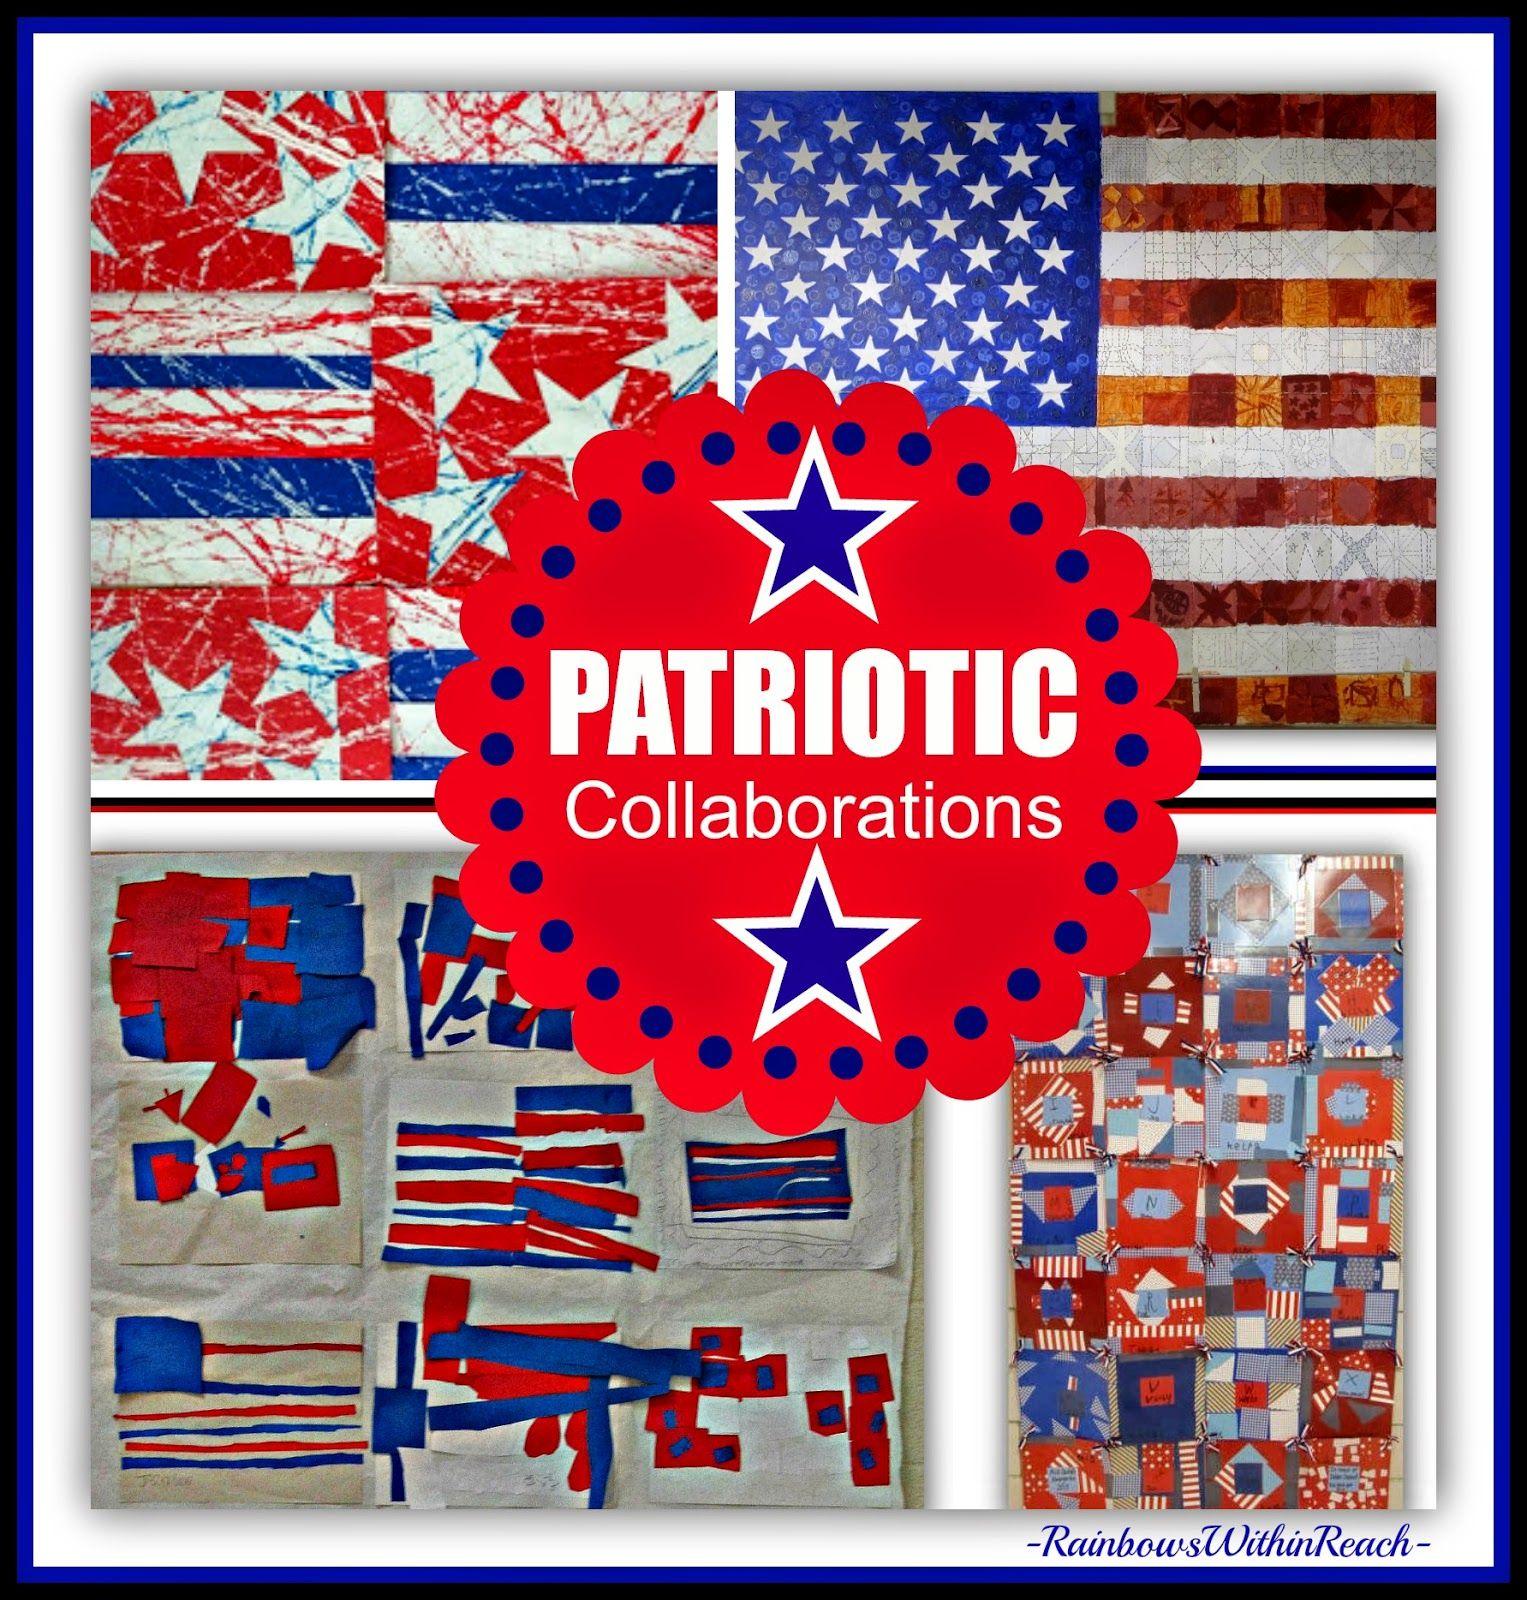 Patriotic Children S Art Collaboration For Fourth Of July Celebration